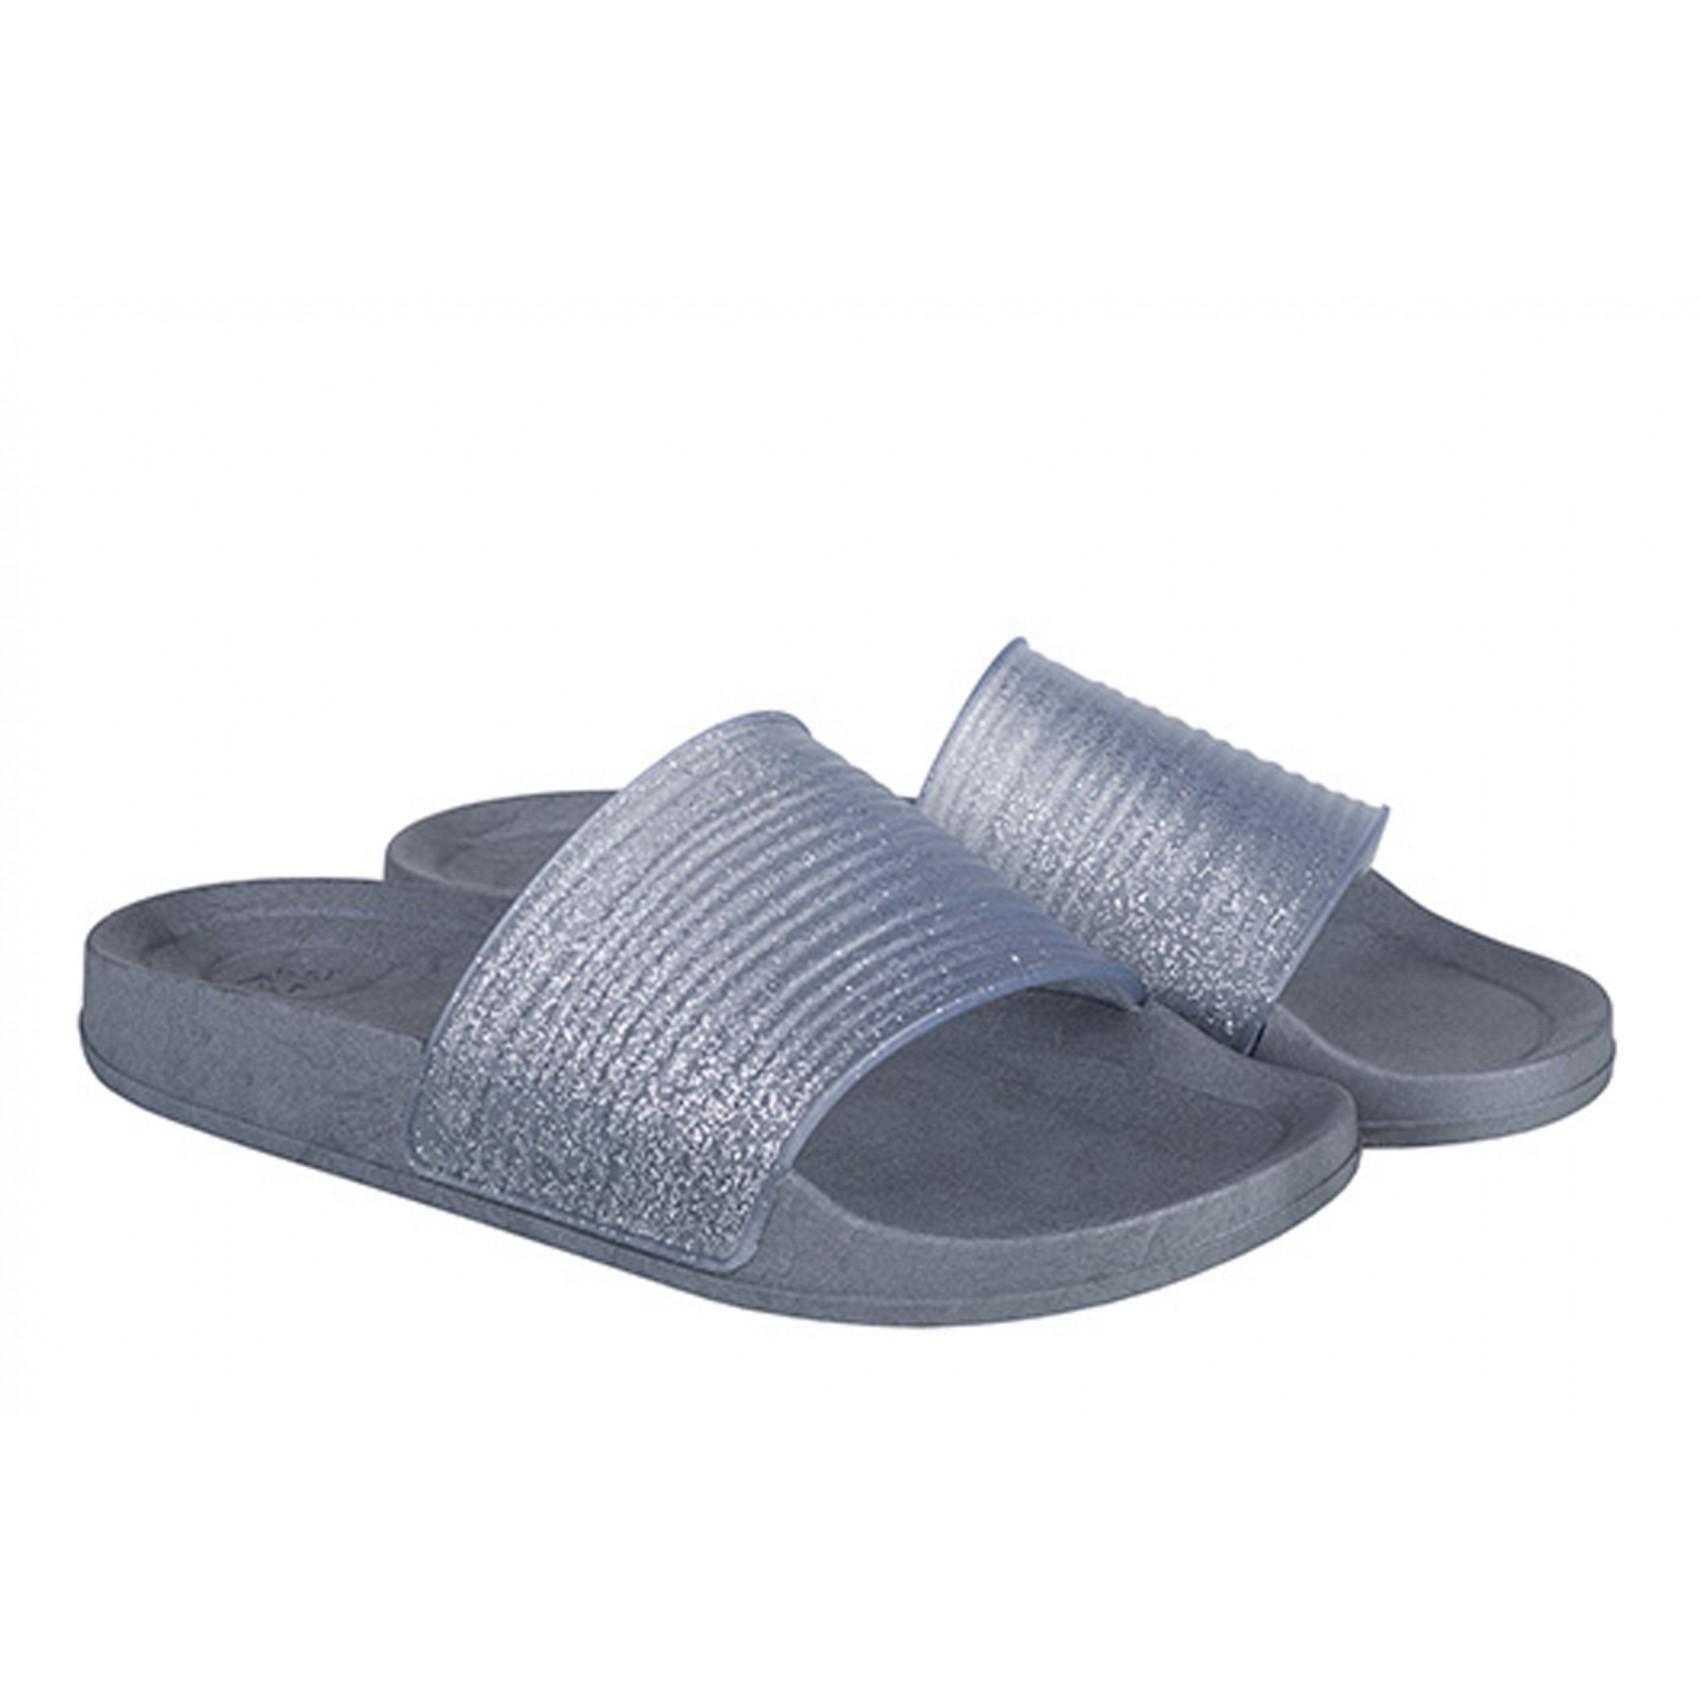 10cc110bfb73 Girl s sandals glitter silver Princesse Ilou